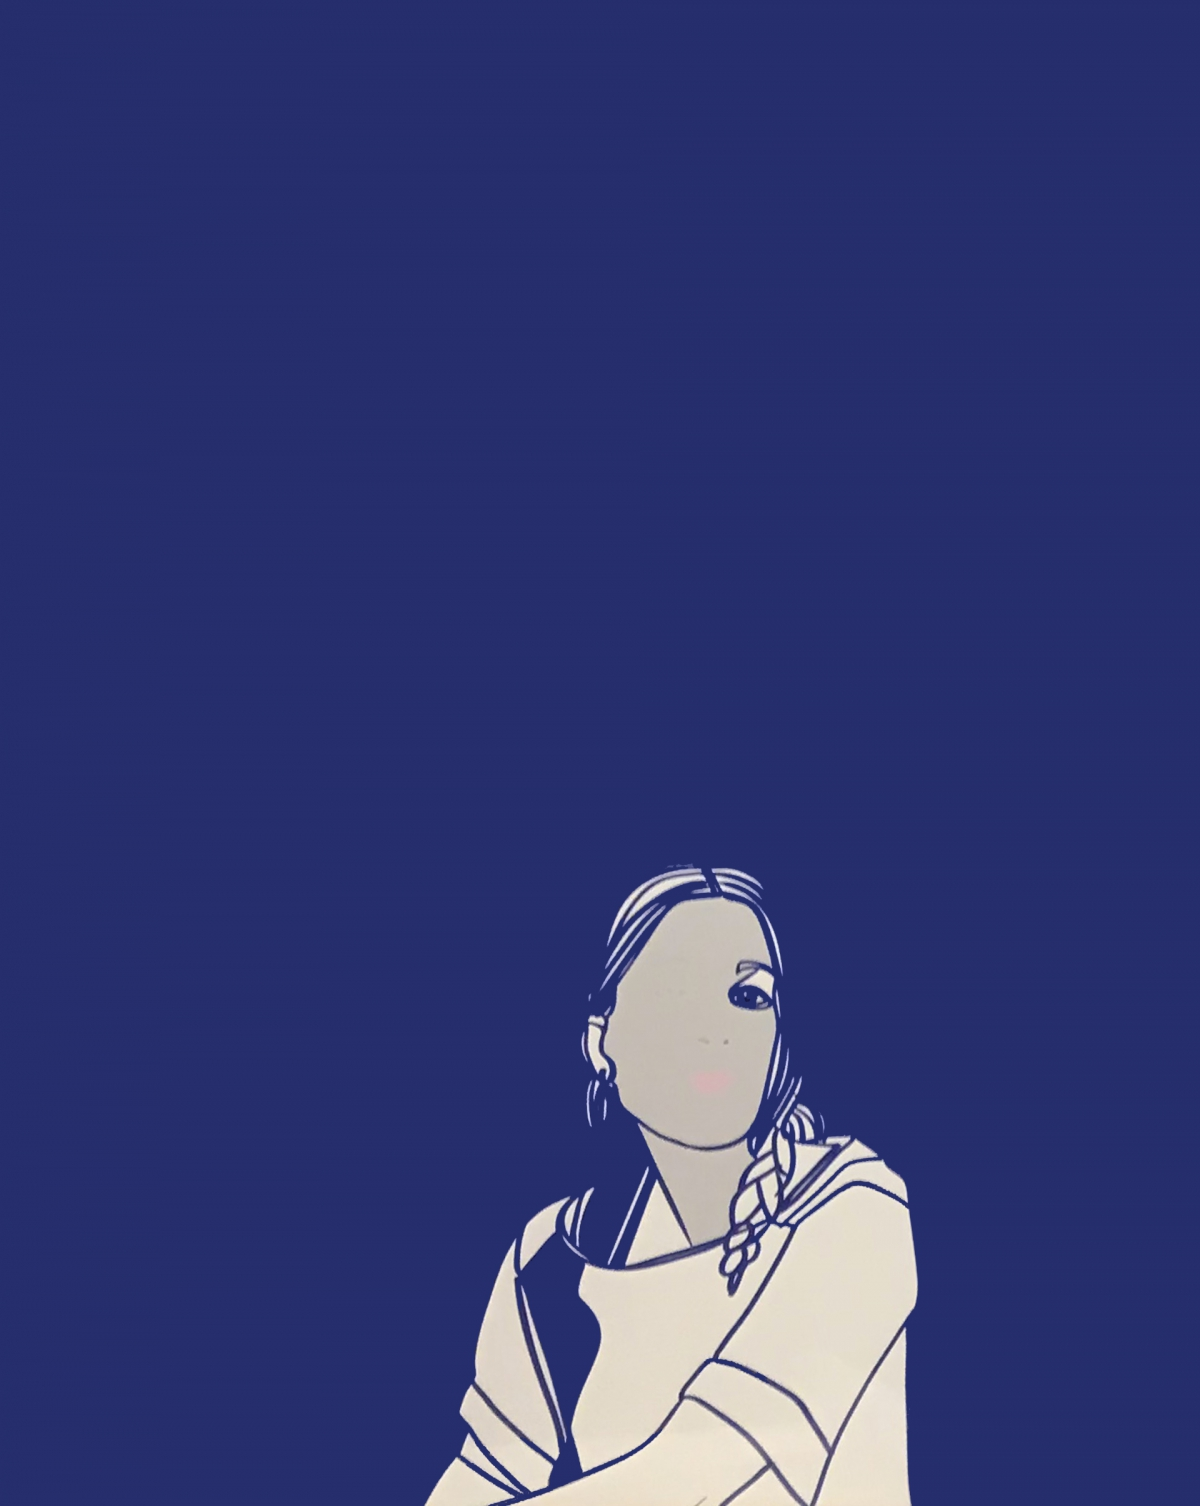 susanna on blue